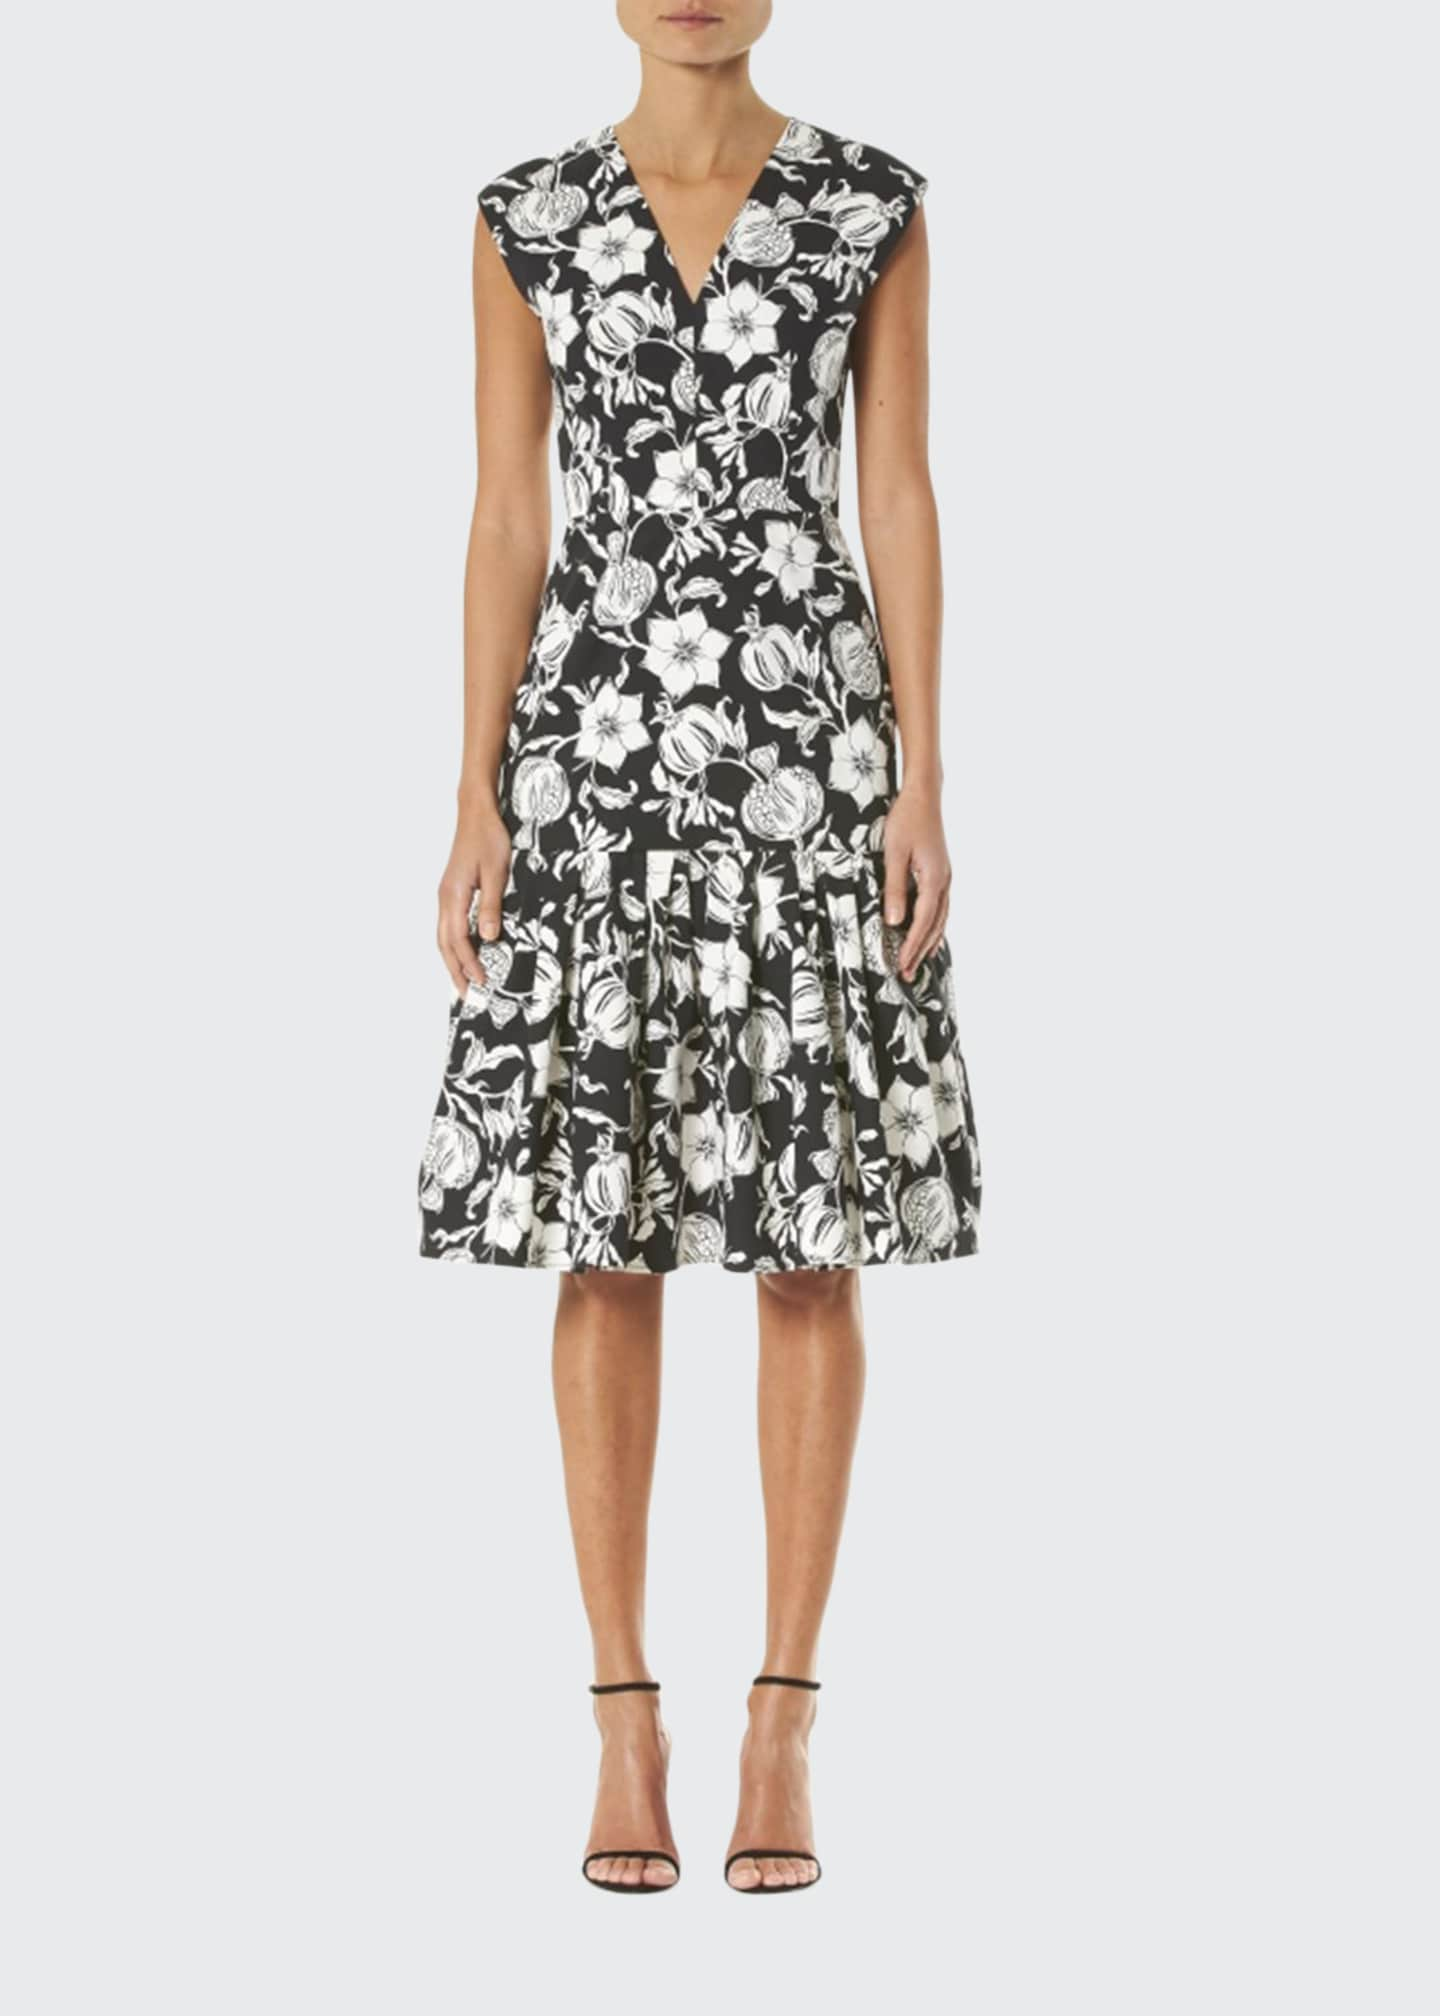 Carolina Herrera Floral-Print Cap-Sleeve Midi Dress